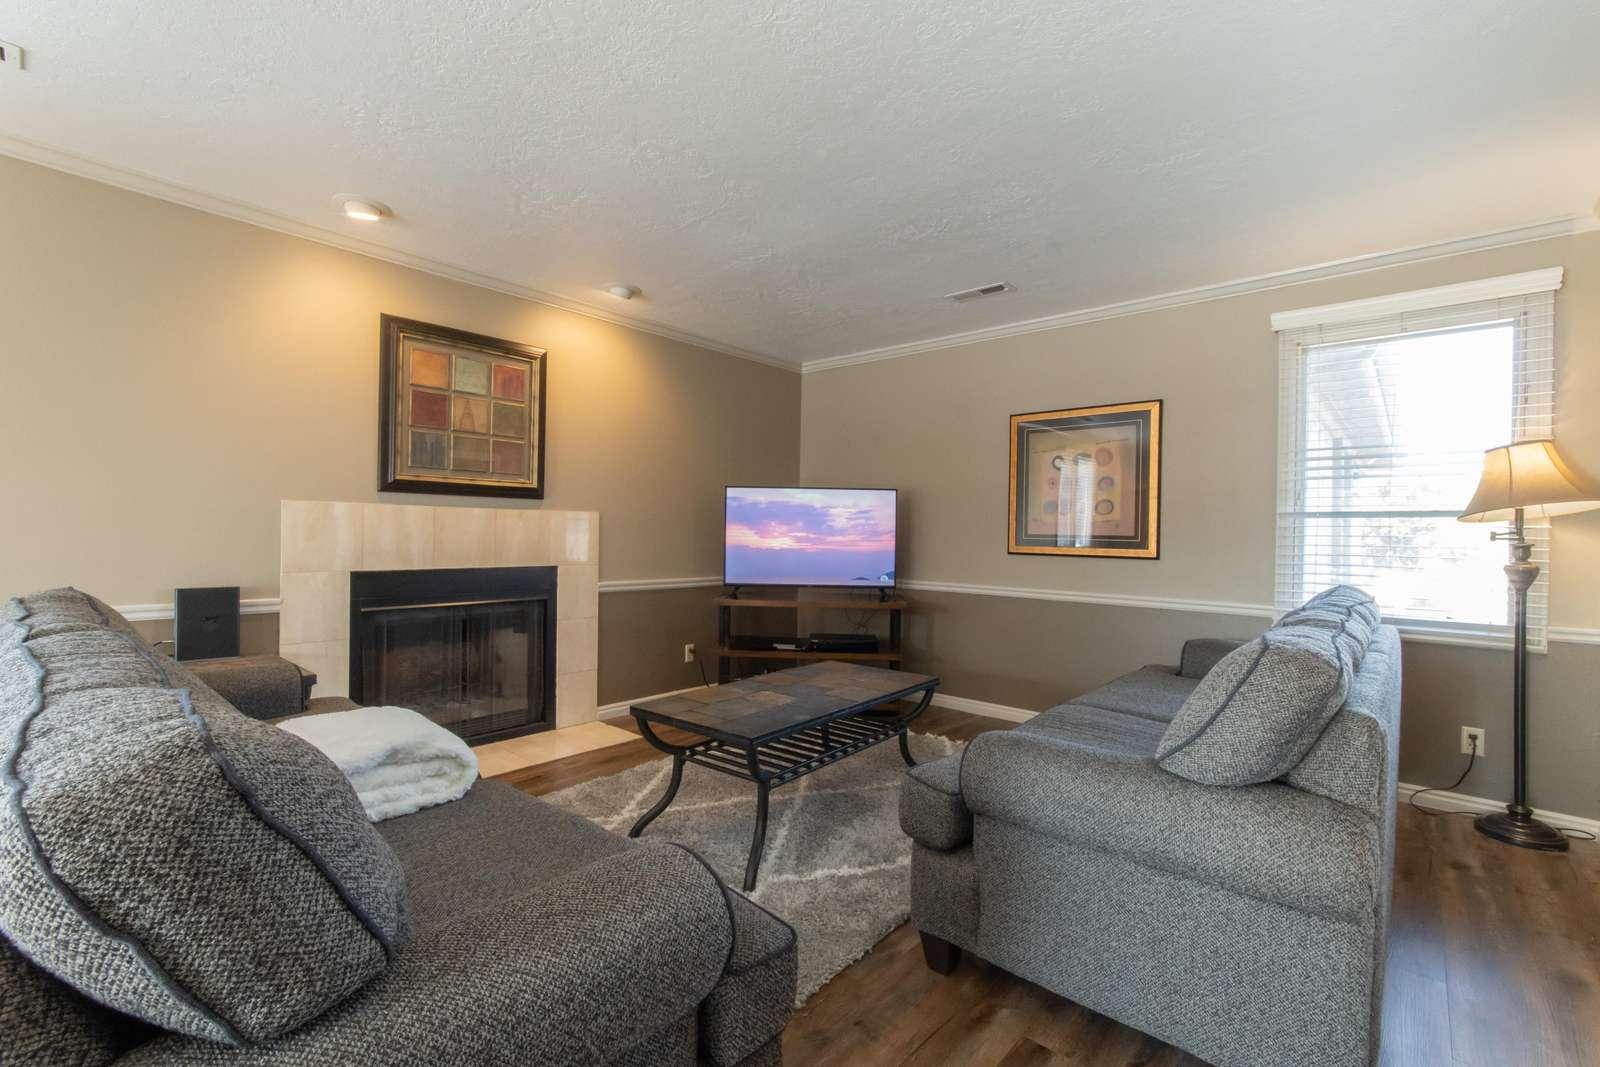 Large Living Room - 2 Regular Size Sofas